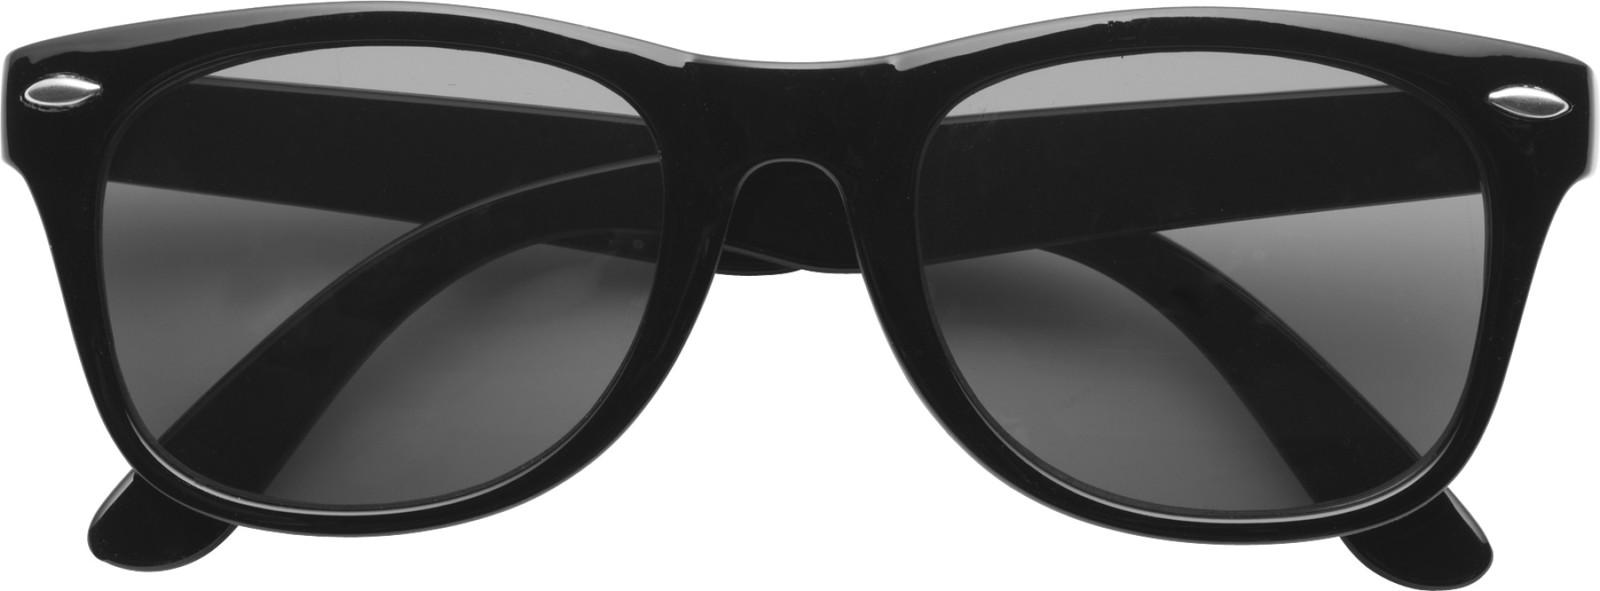 PC and PVC sunglasses - Black